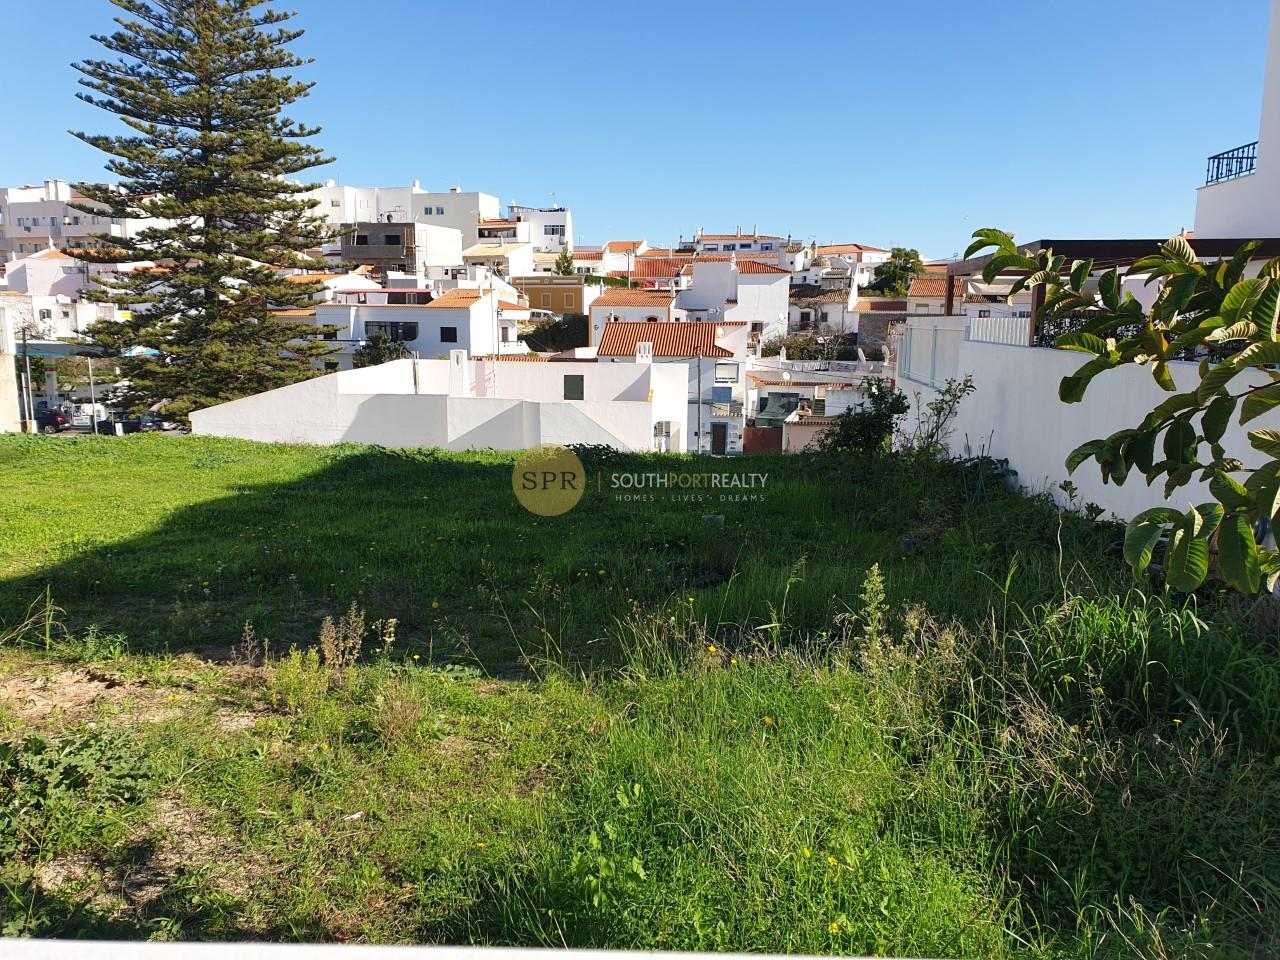 Lote de Terreno Urbano bem localizado Alcantarilha 10mn das praias